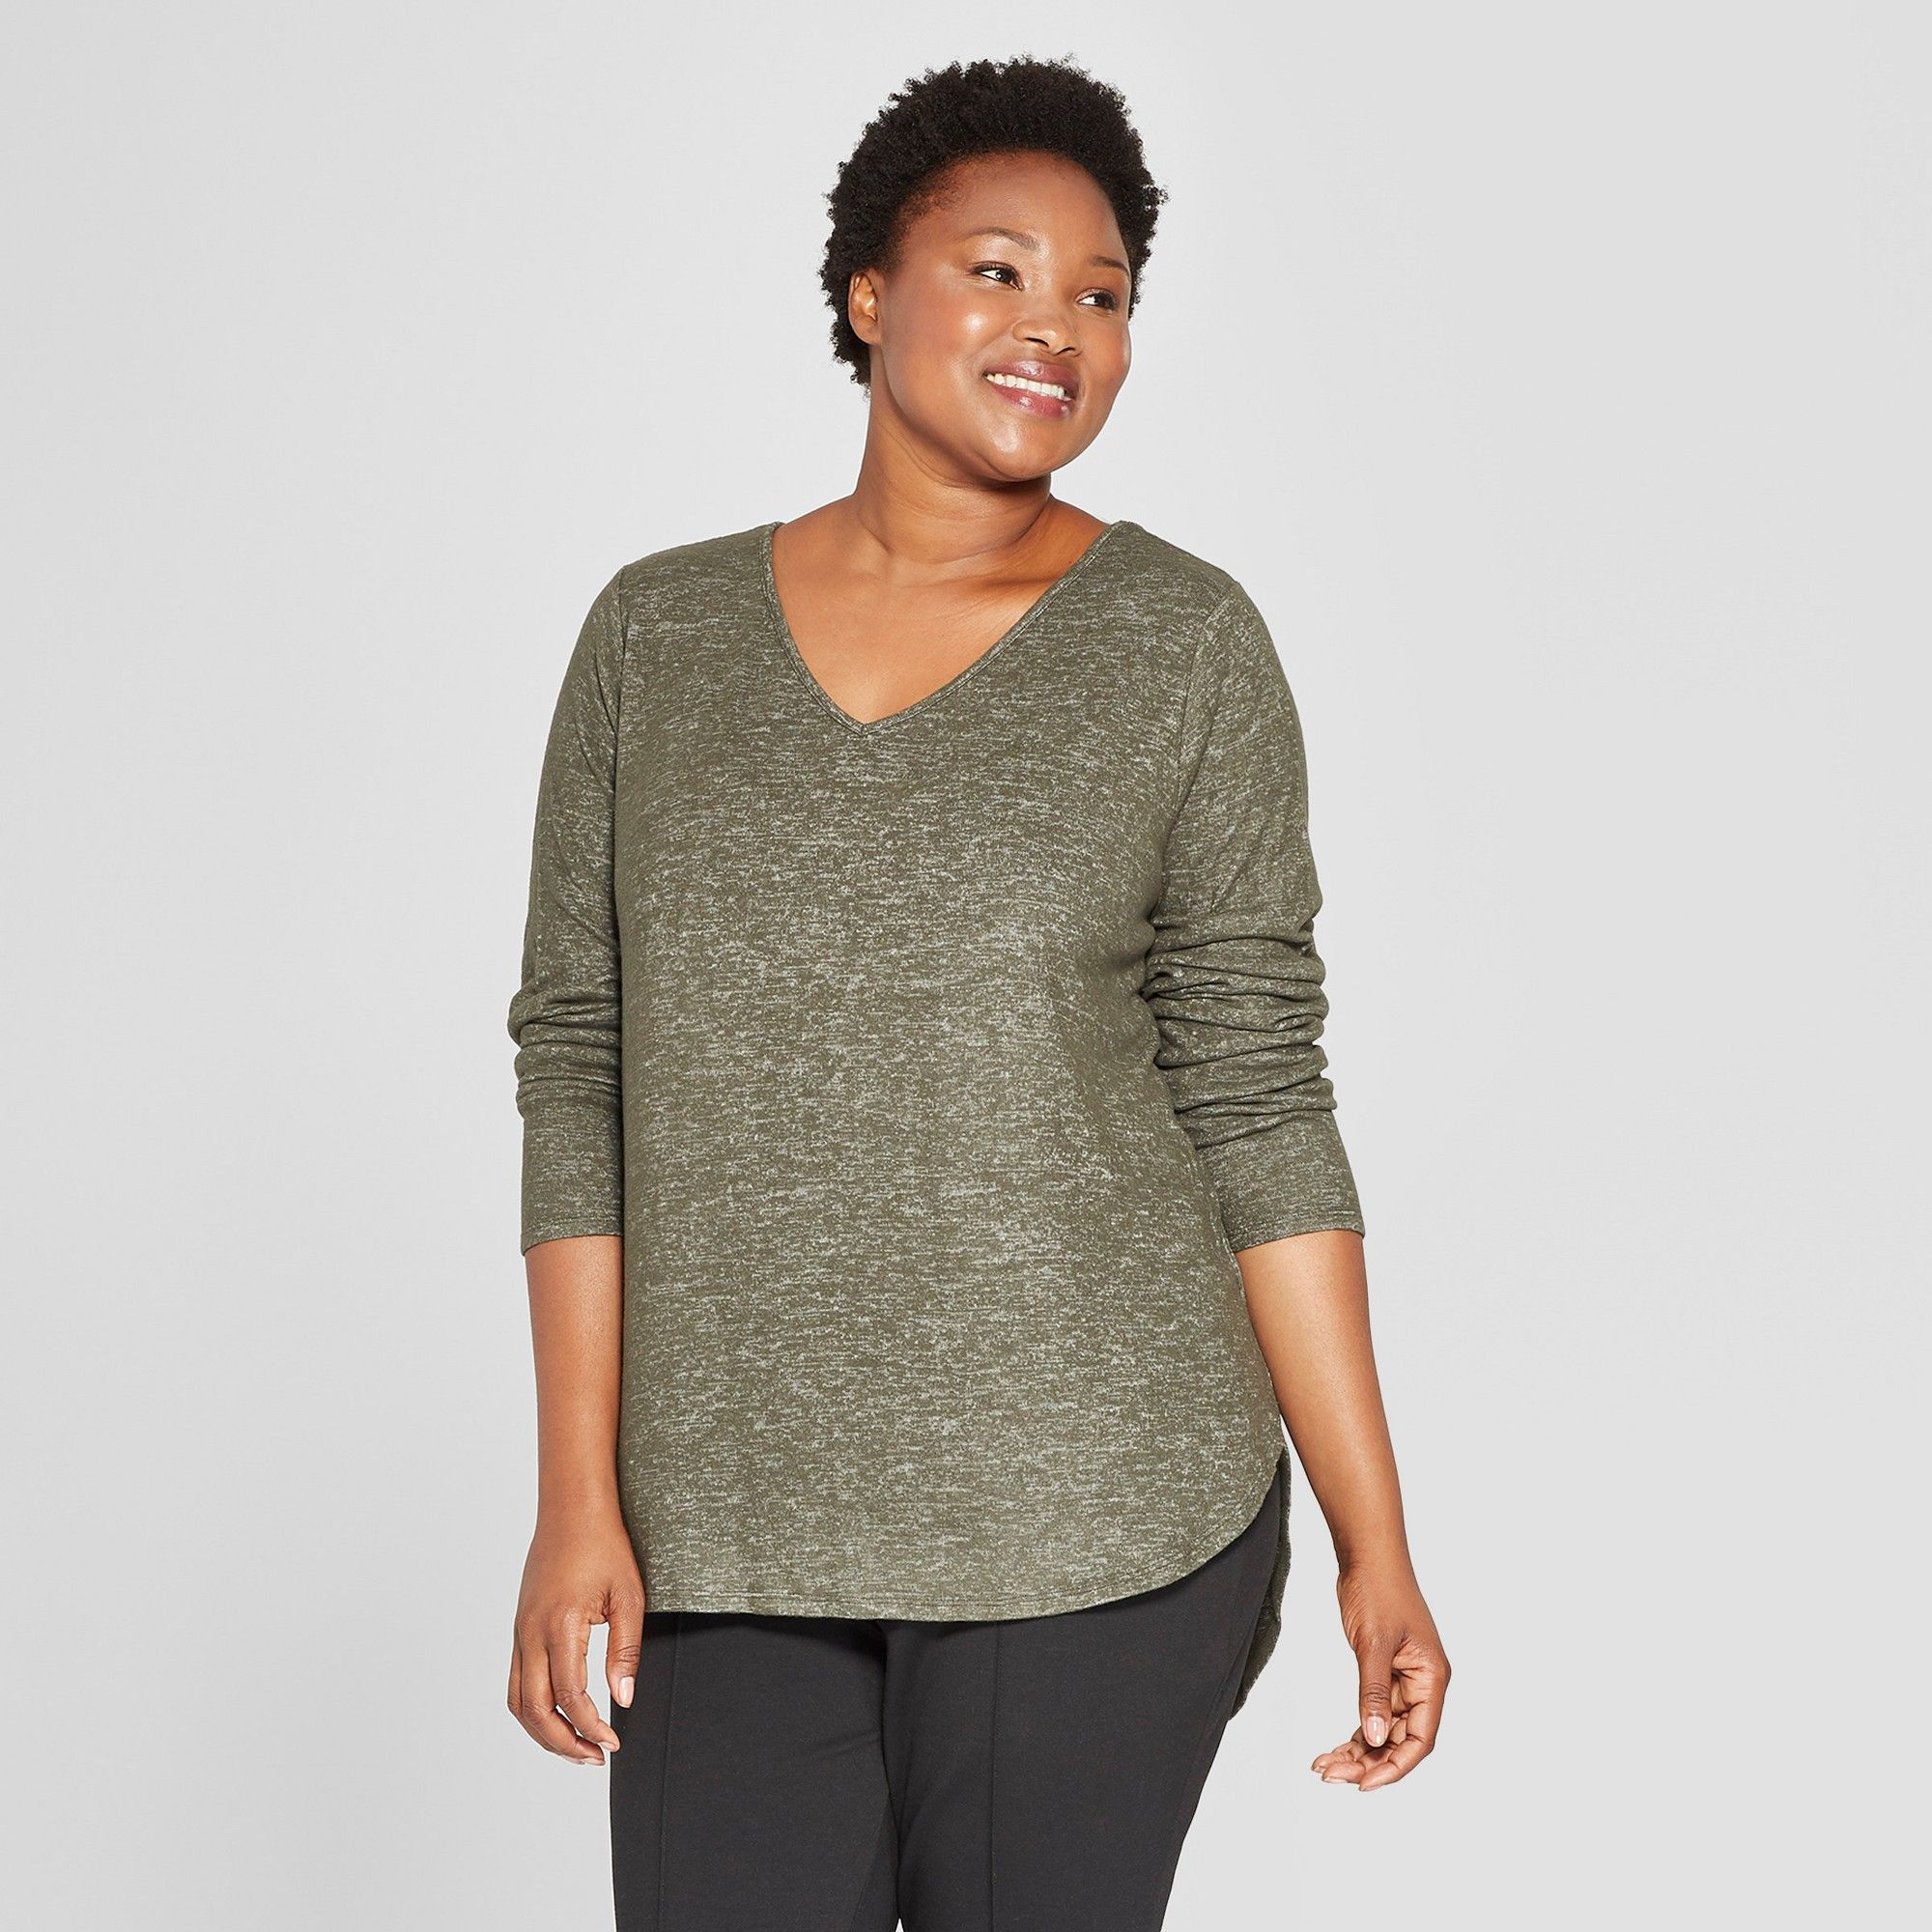 bc540e8dc Women's Plus Size Cozy Long Sleeve V-Neck Pullover - Ava & Viv Heather  Olive 1X